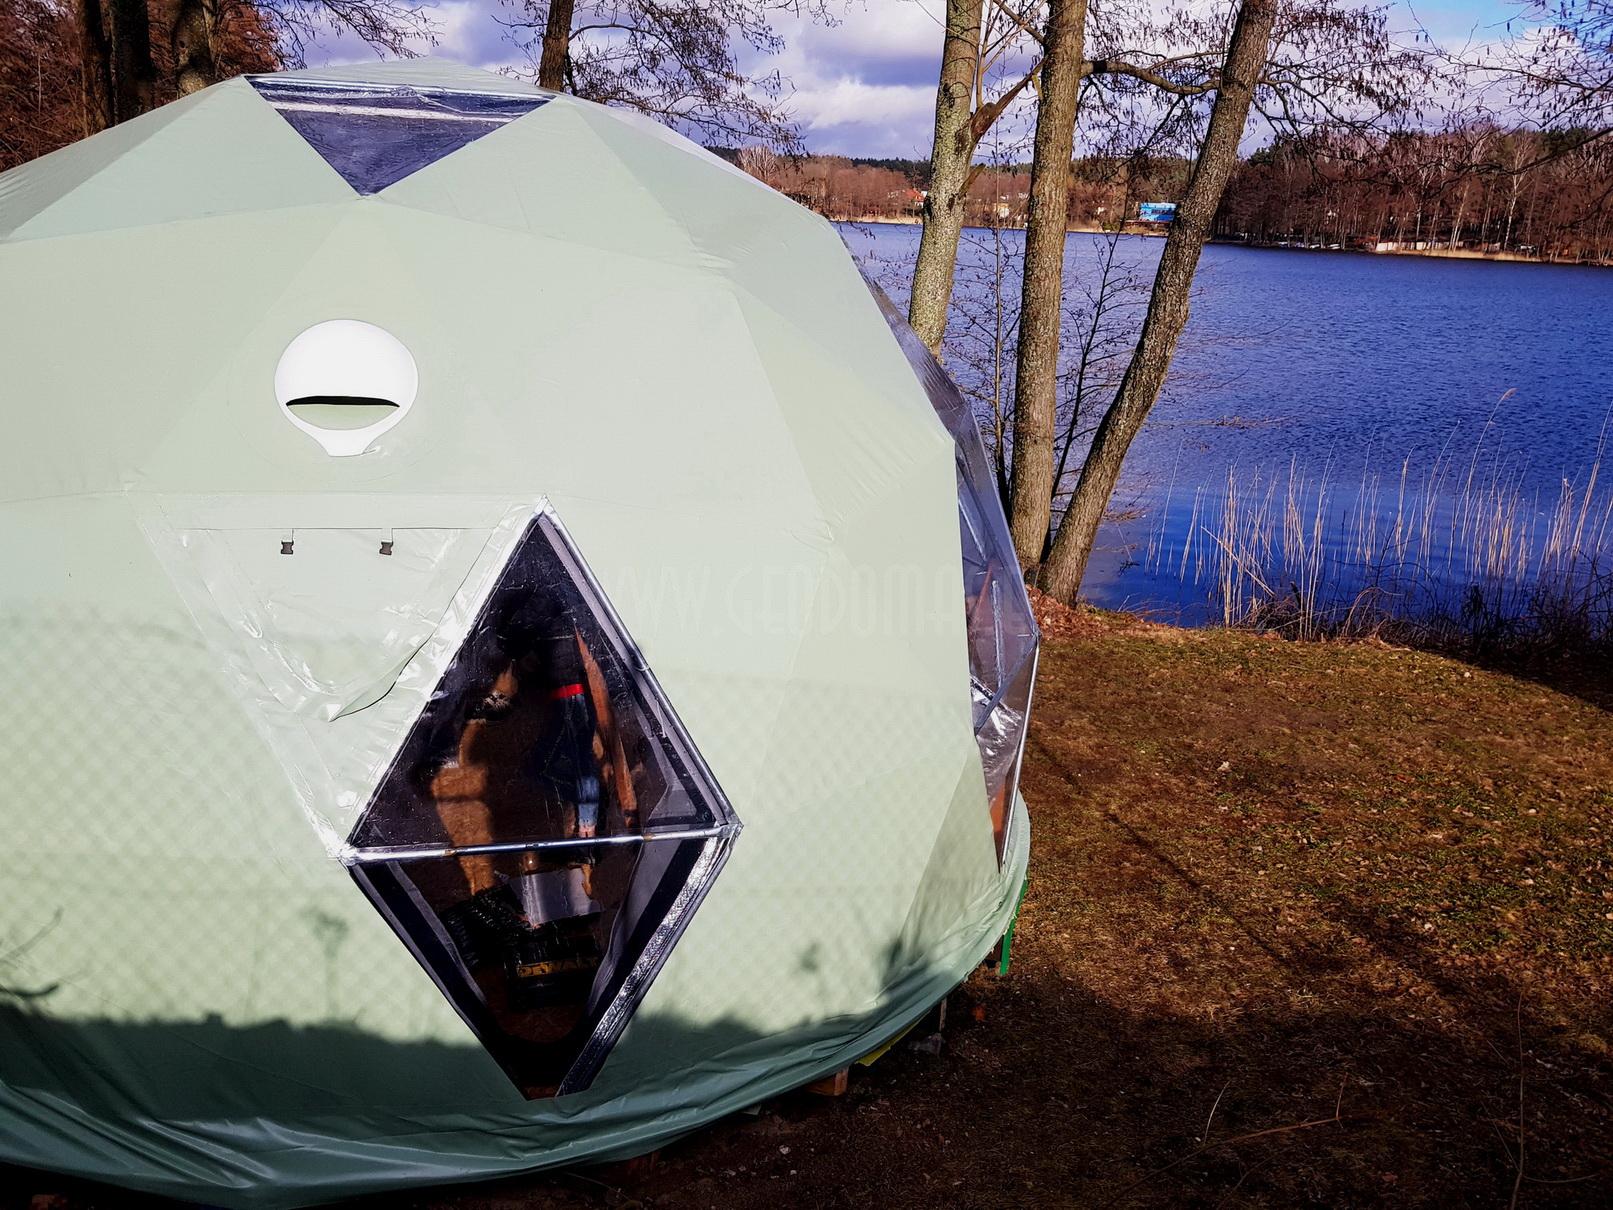 Géo-maison Dome 25m2 Ø5m F3 | Poland, Olsztyn